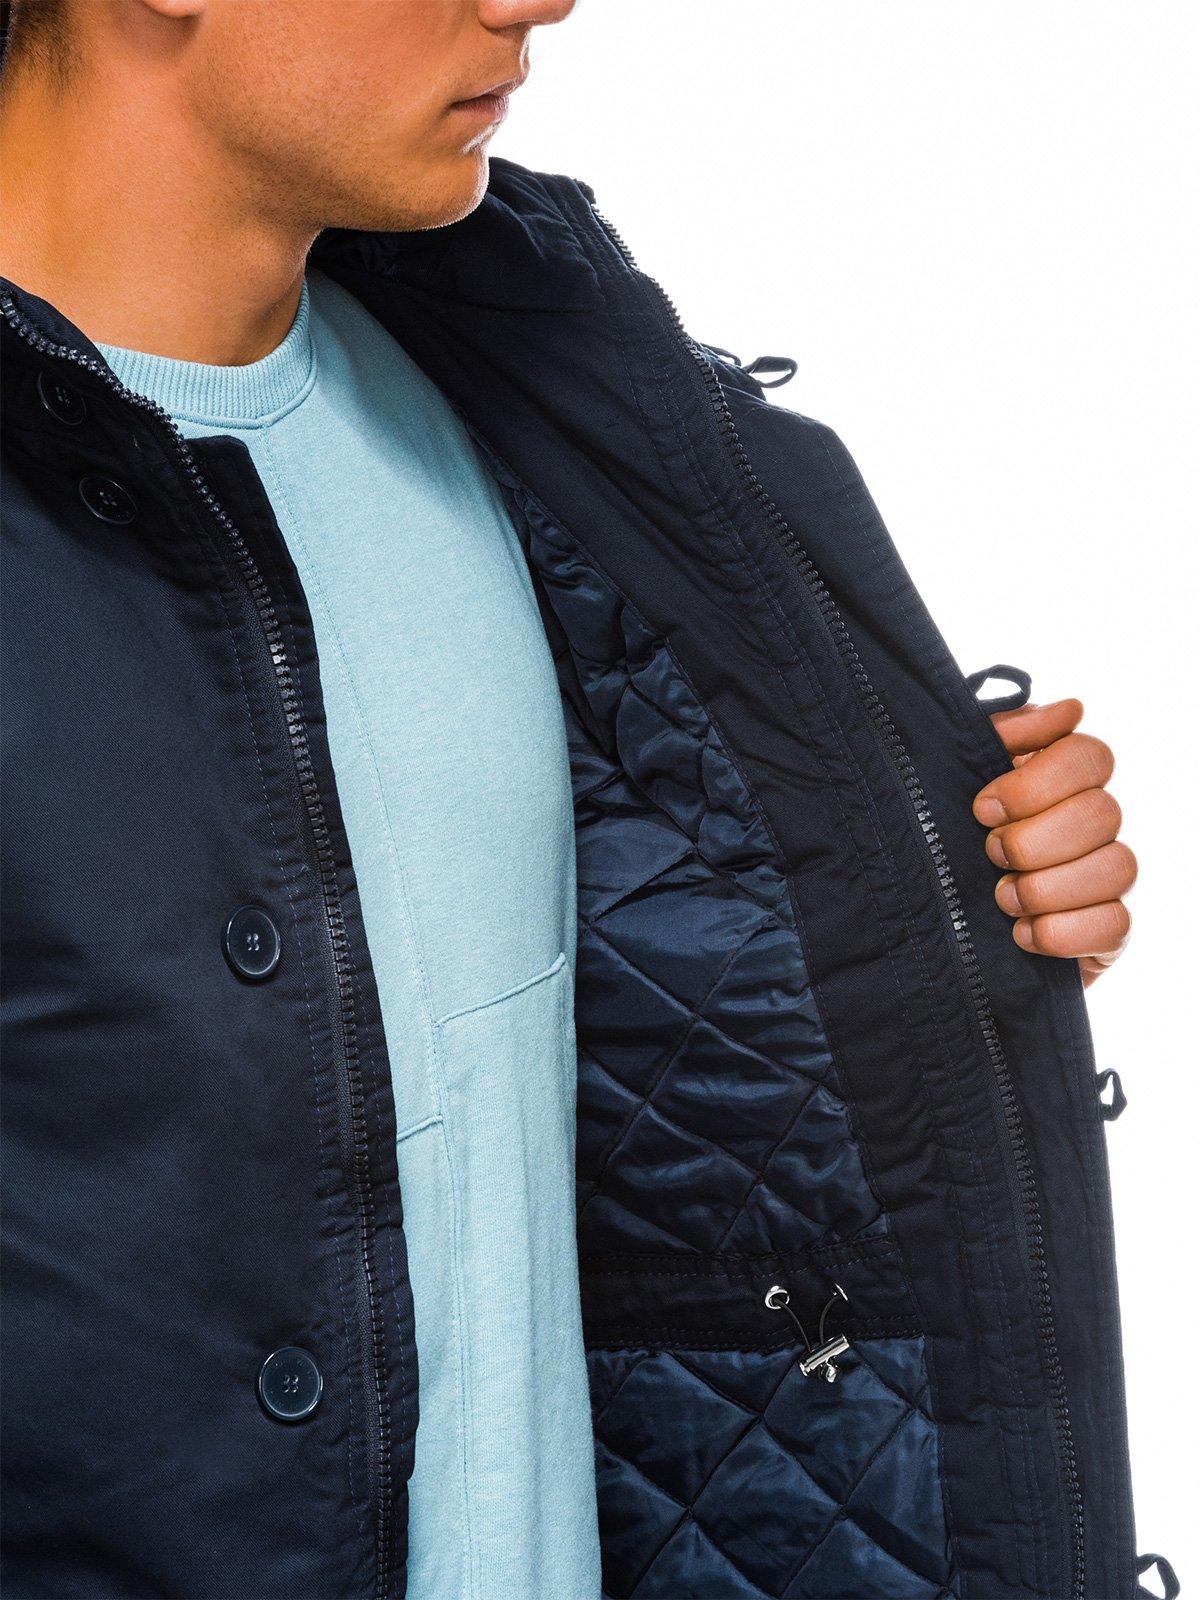 Купить Куртка чоловіча зимова парка C365 - темно-синя, Ombre Clothing